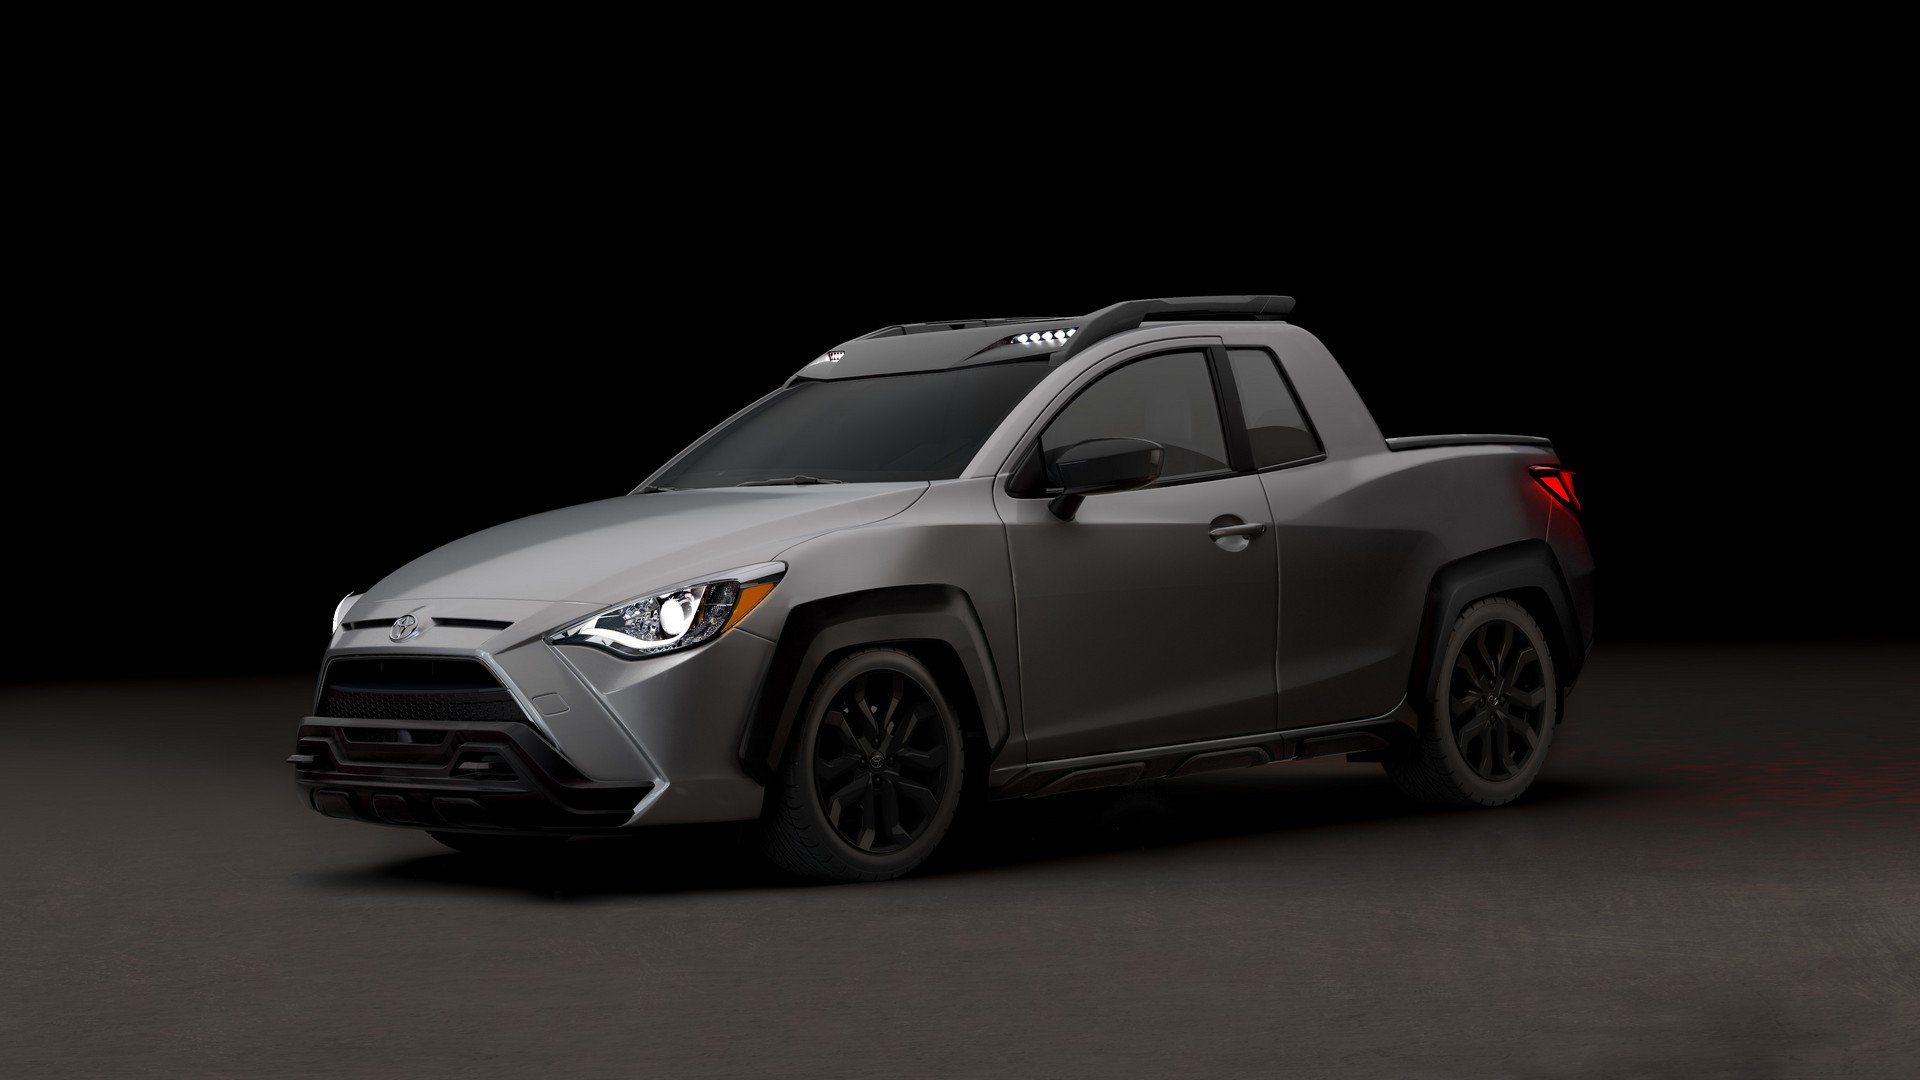 Toyota Pamer Pikap Yaris Versi April Mop Medcom Id